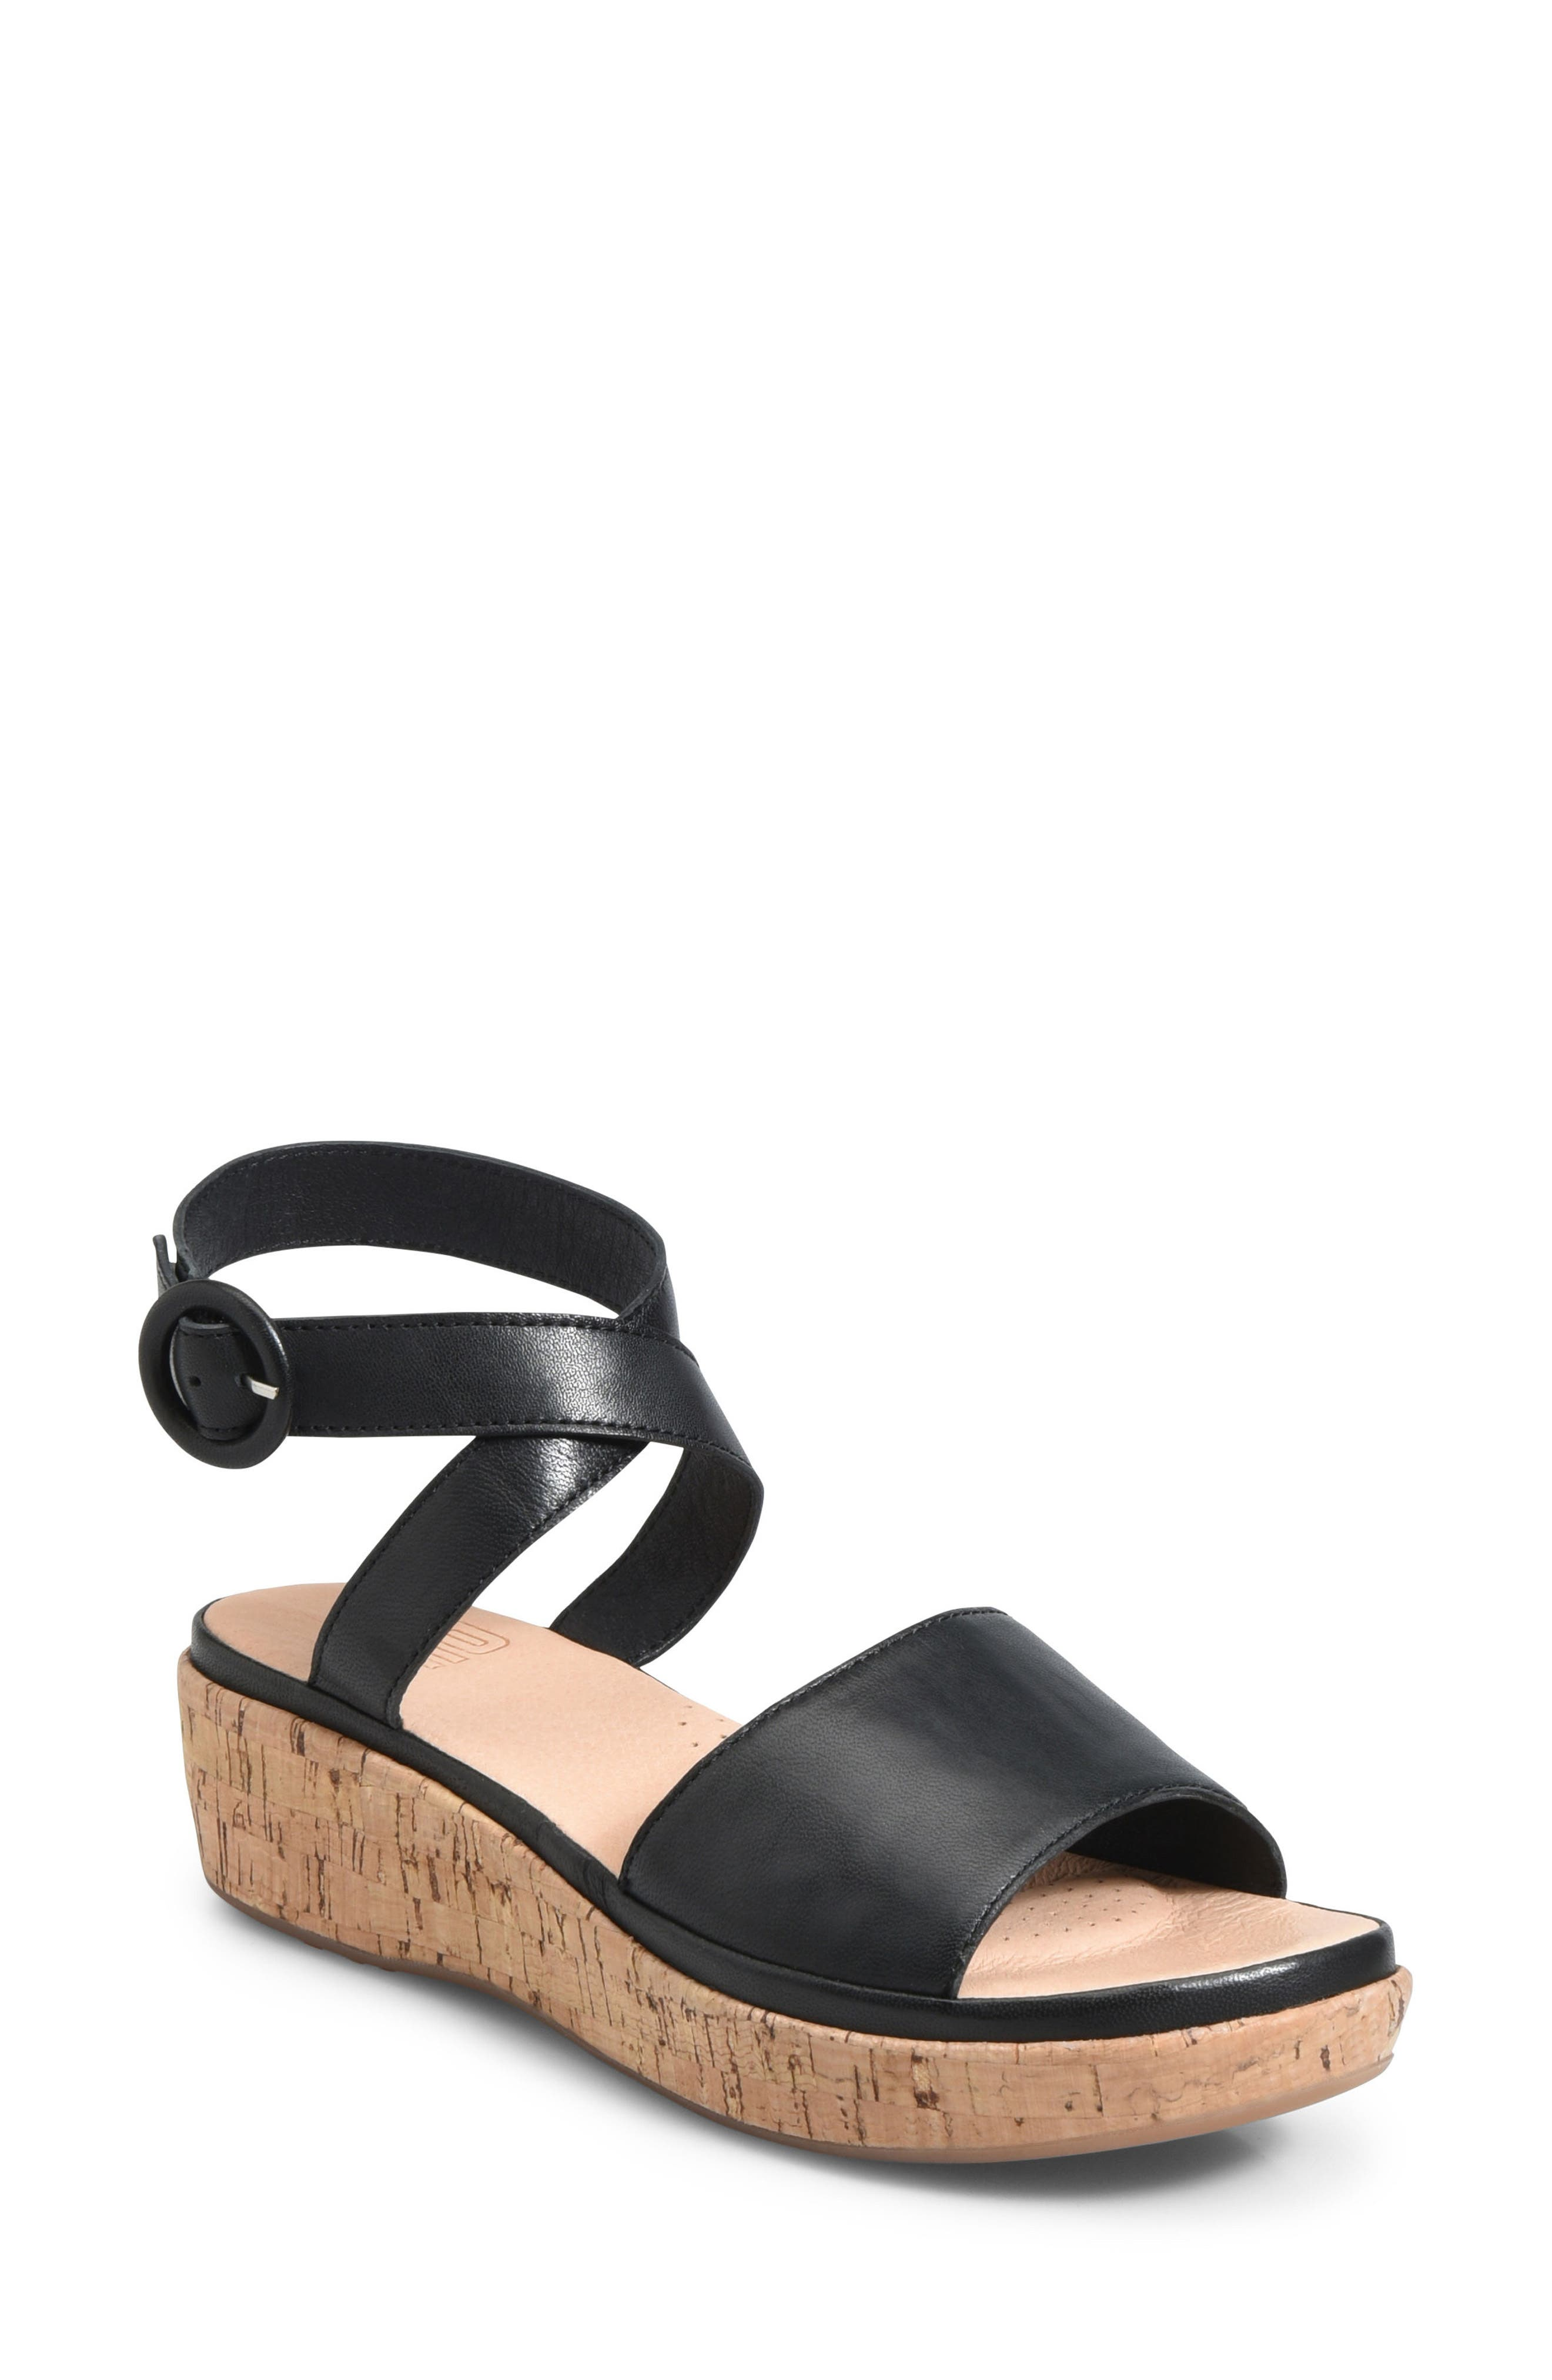 Ono Dreamy Platform Wedge Sandal, Black